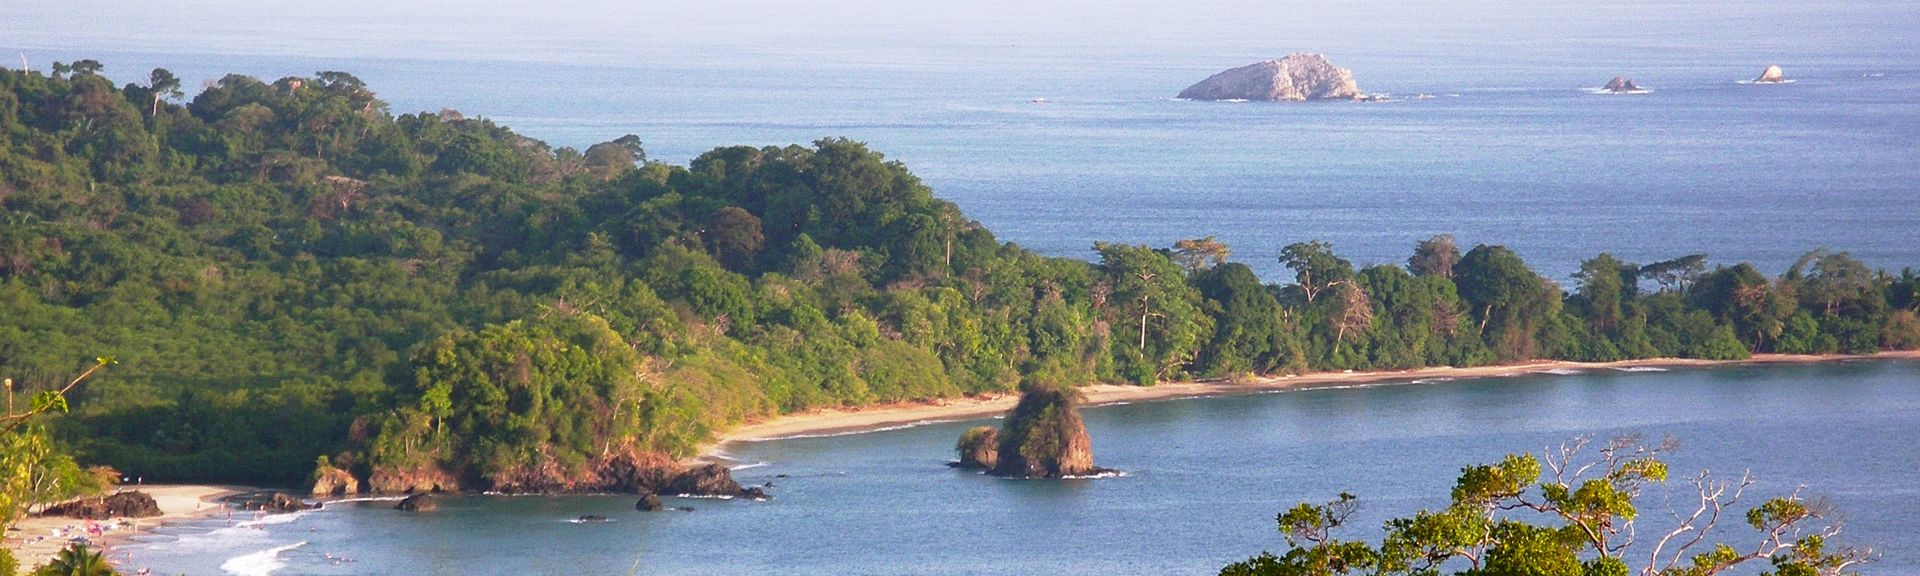 San Lorenzo, San Jose (province), Costa Rica